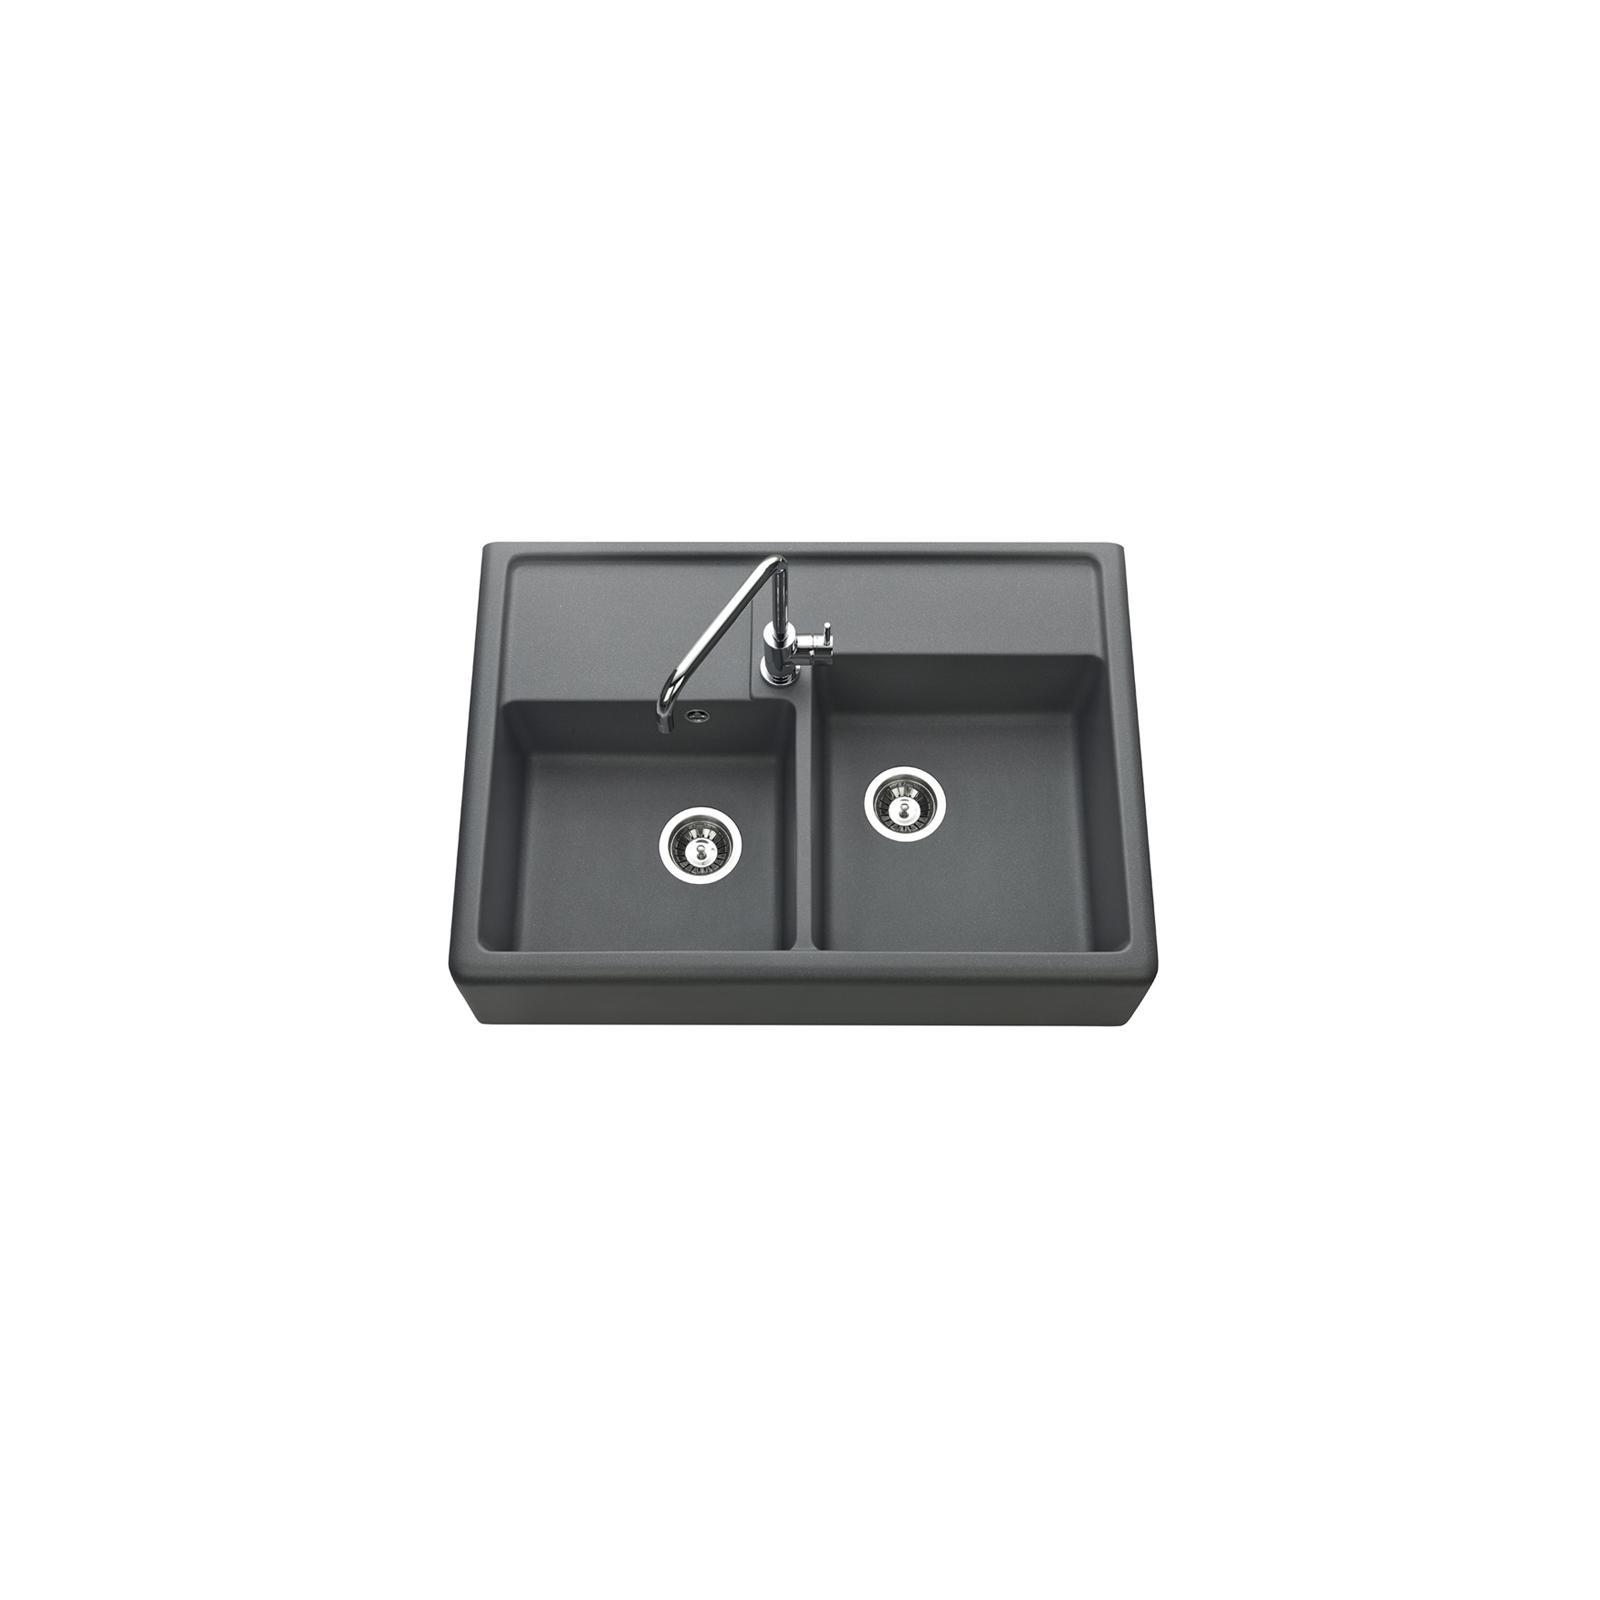 Evier haut de gamme Thibert III granit gris titanium - 2 bacs dessus